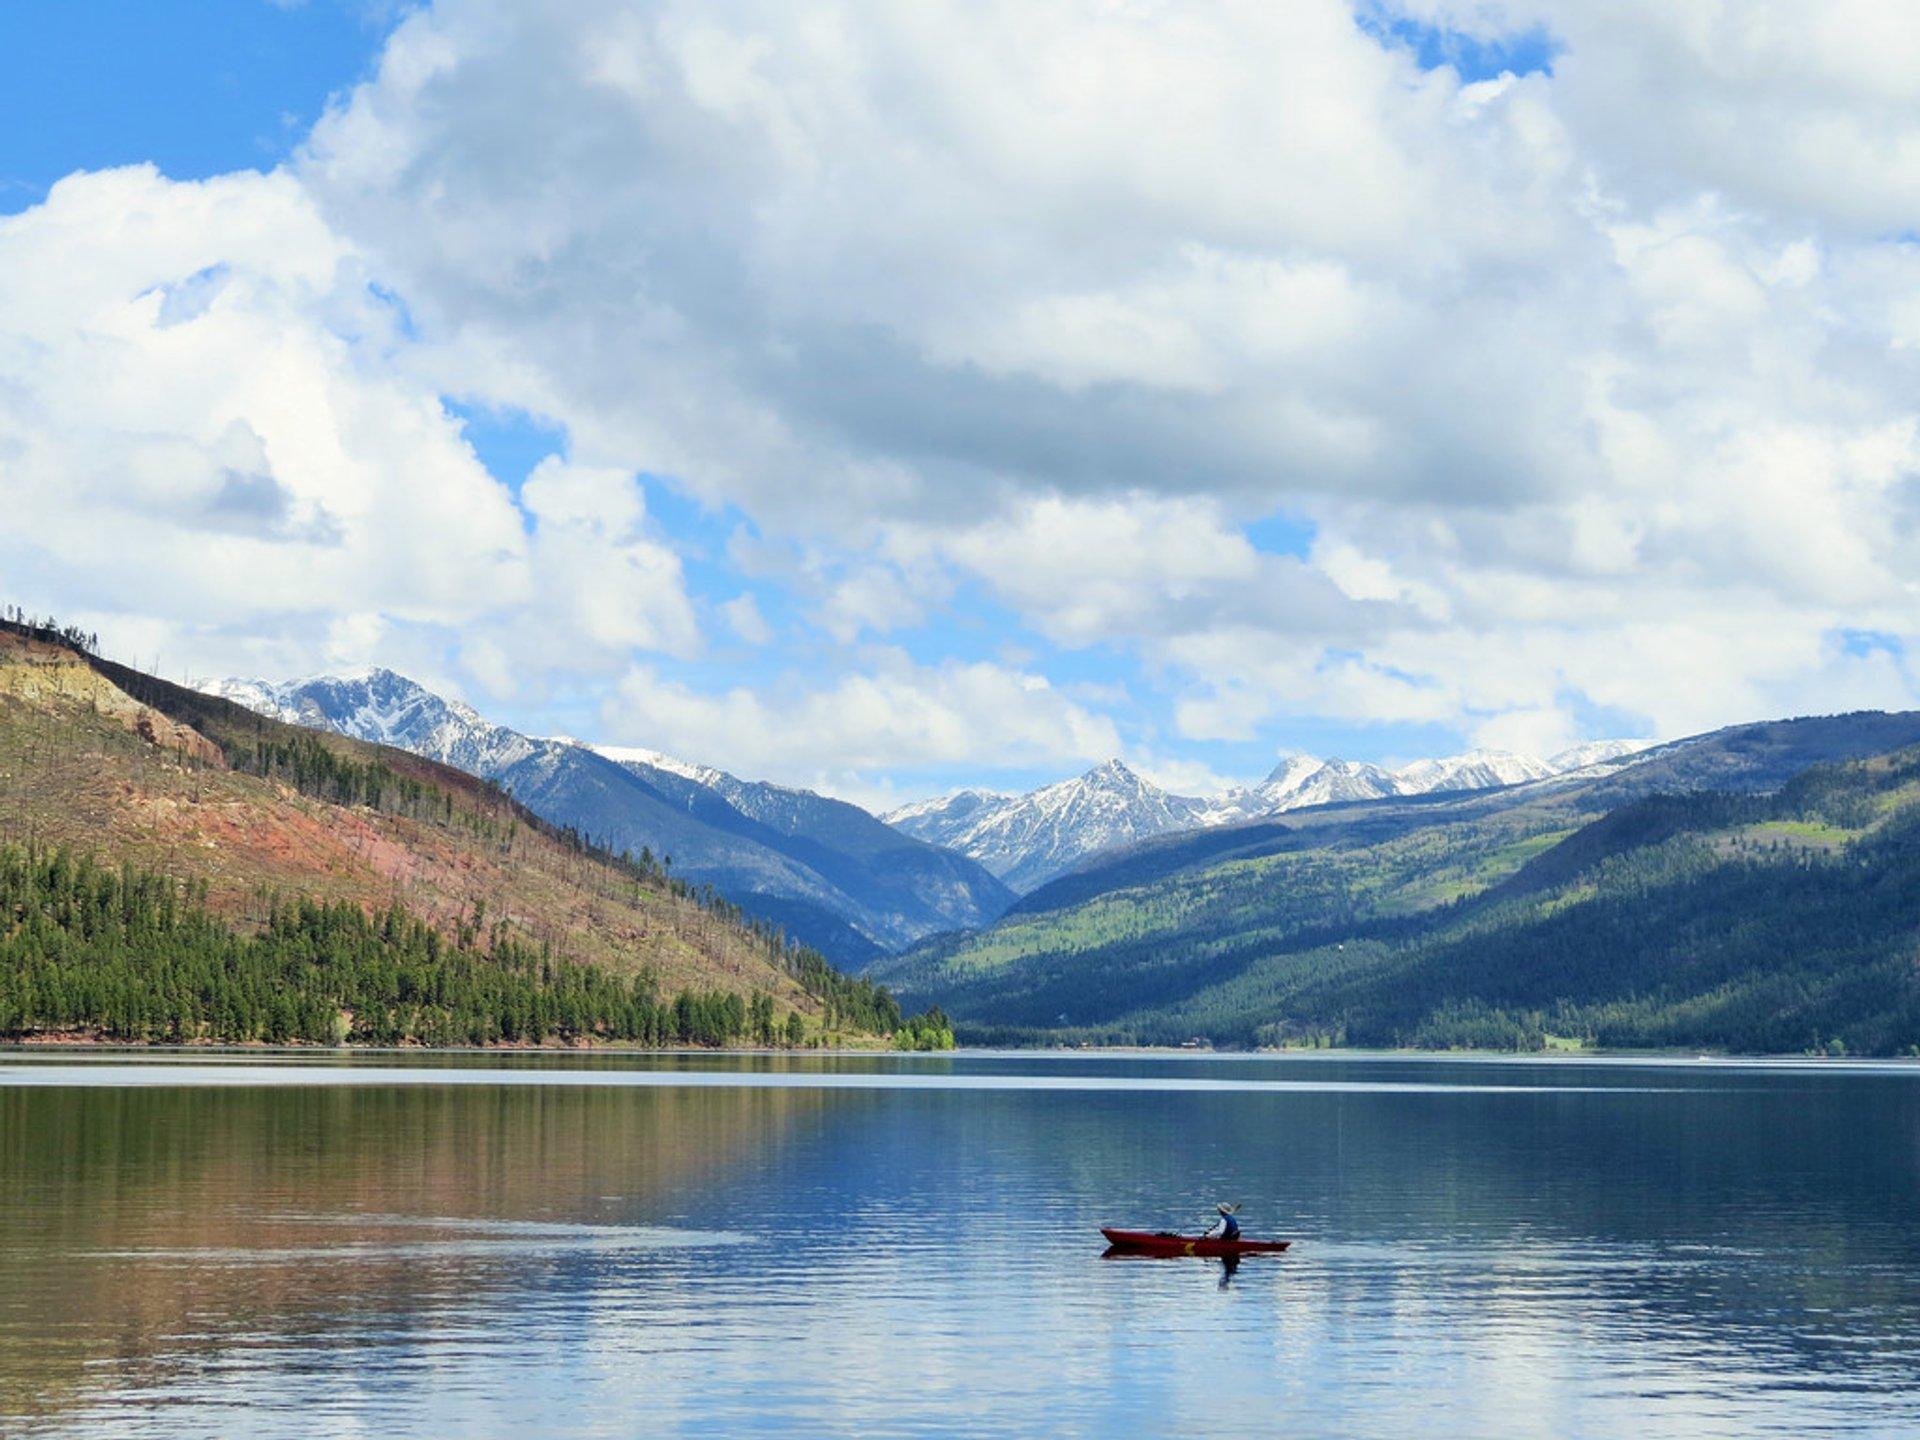 Kayaking in Colorado 2020 - Best Time